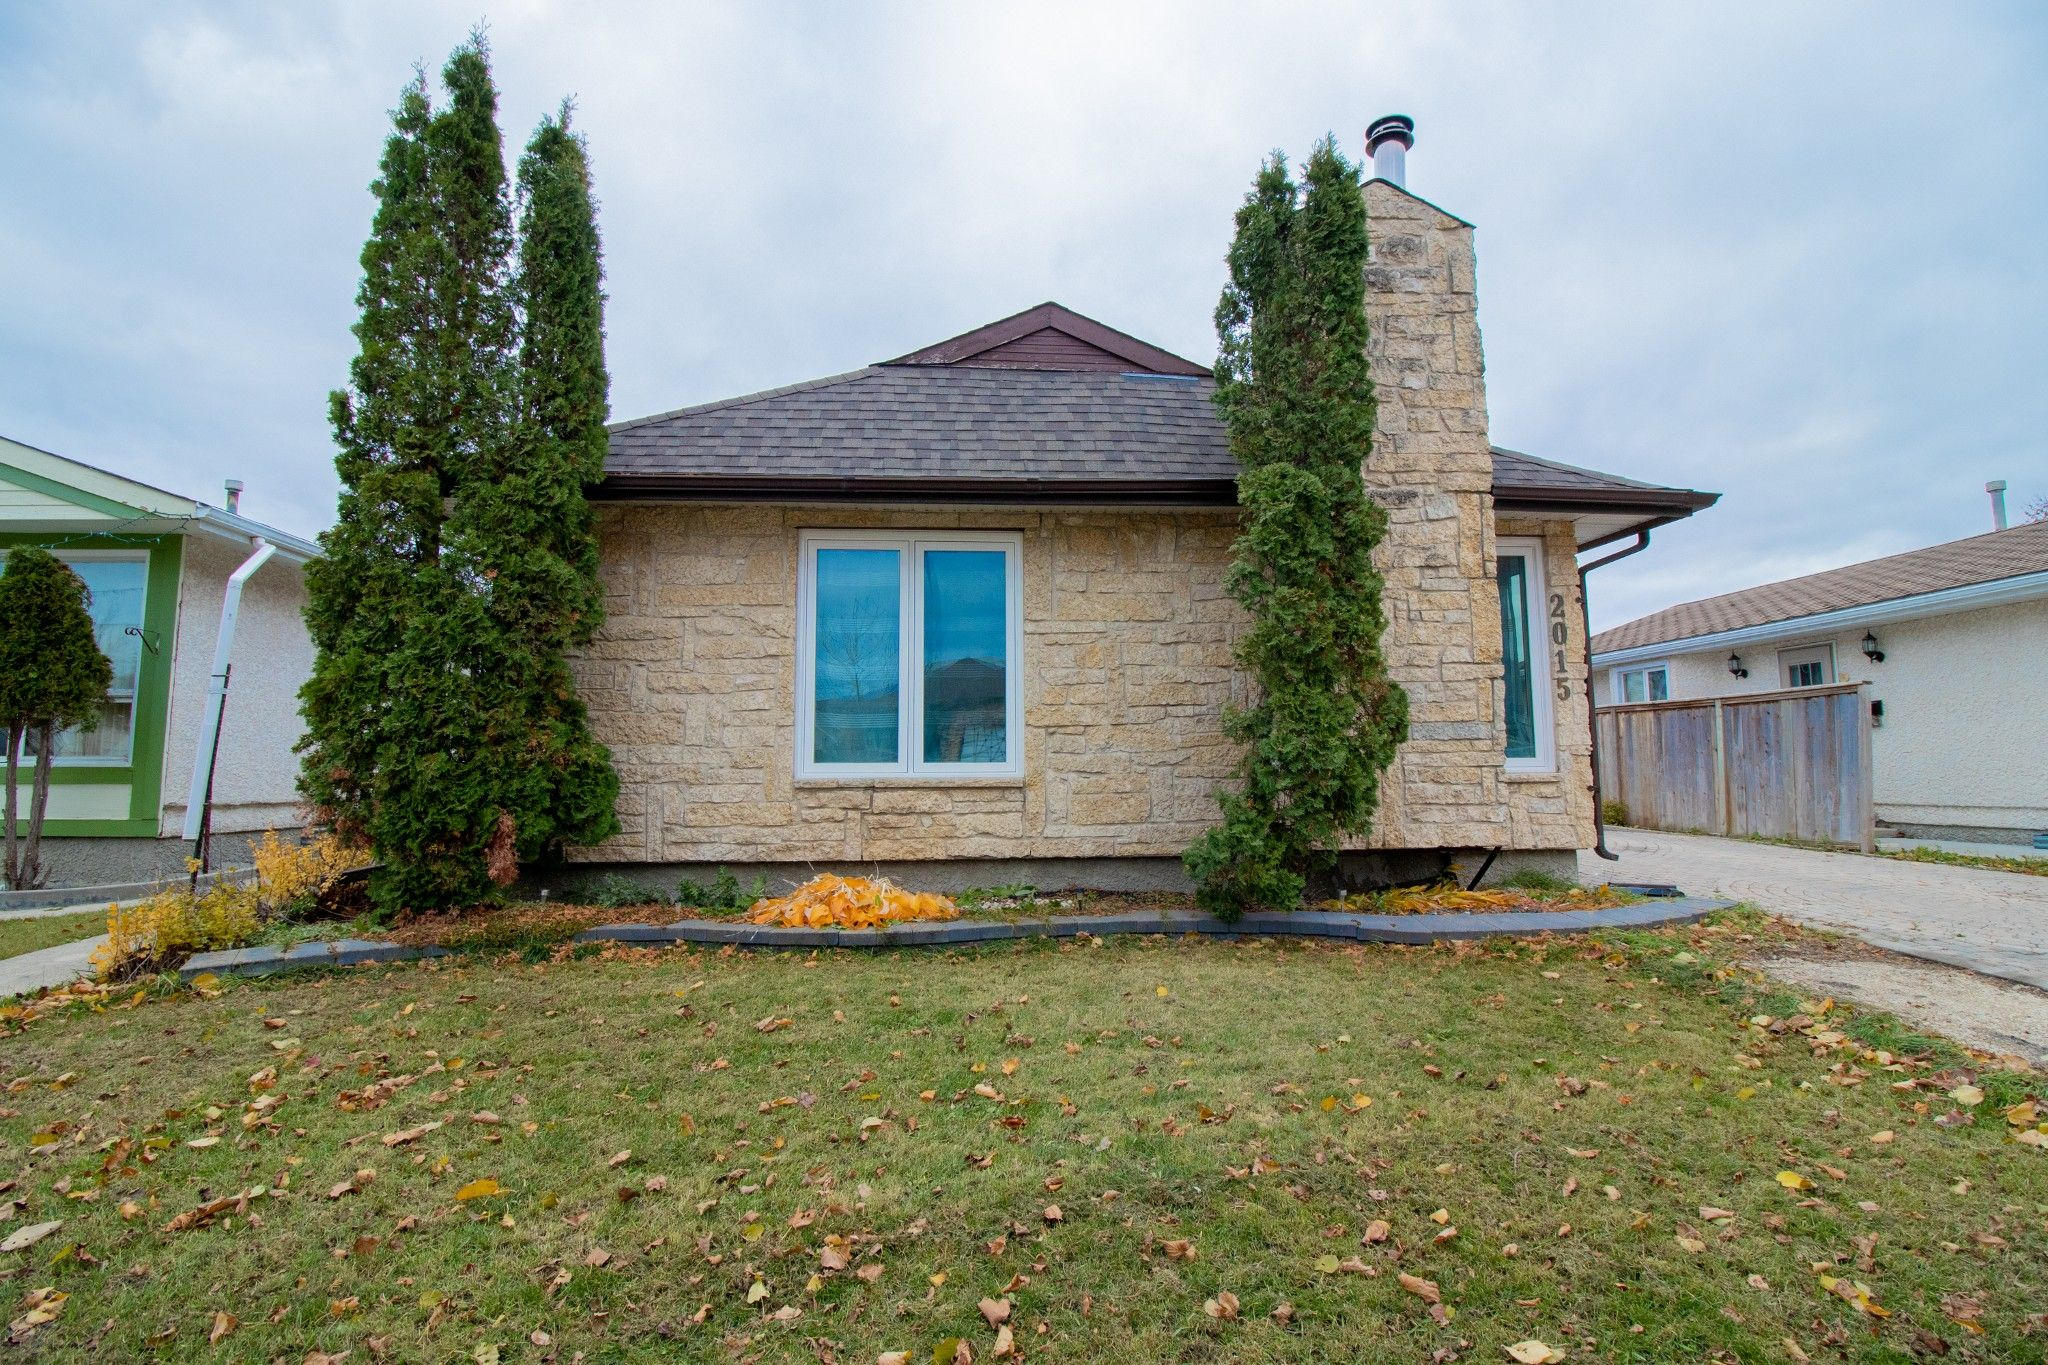 Main Photo: 2015 Sinclair Street in Winnipeg: Single Family Detached for sale (4F)  : MLS®# 202002476